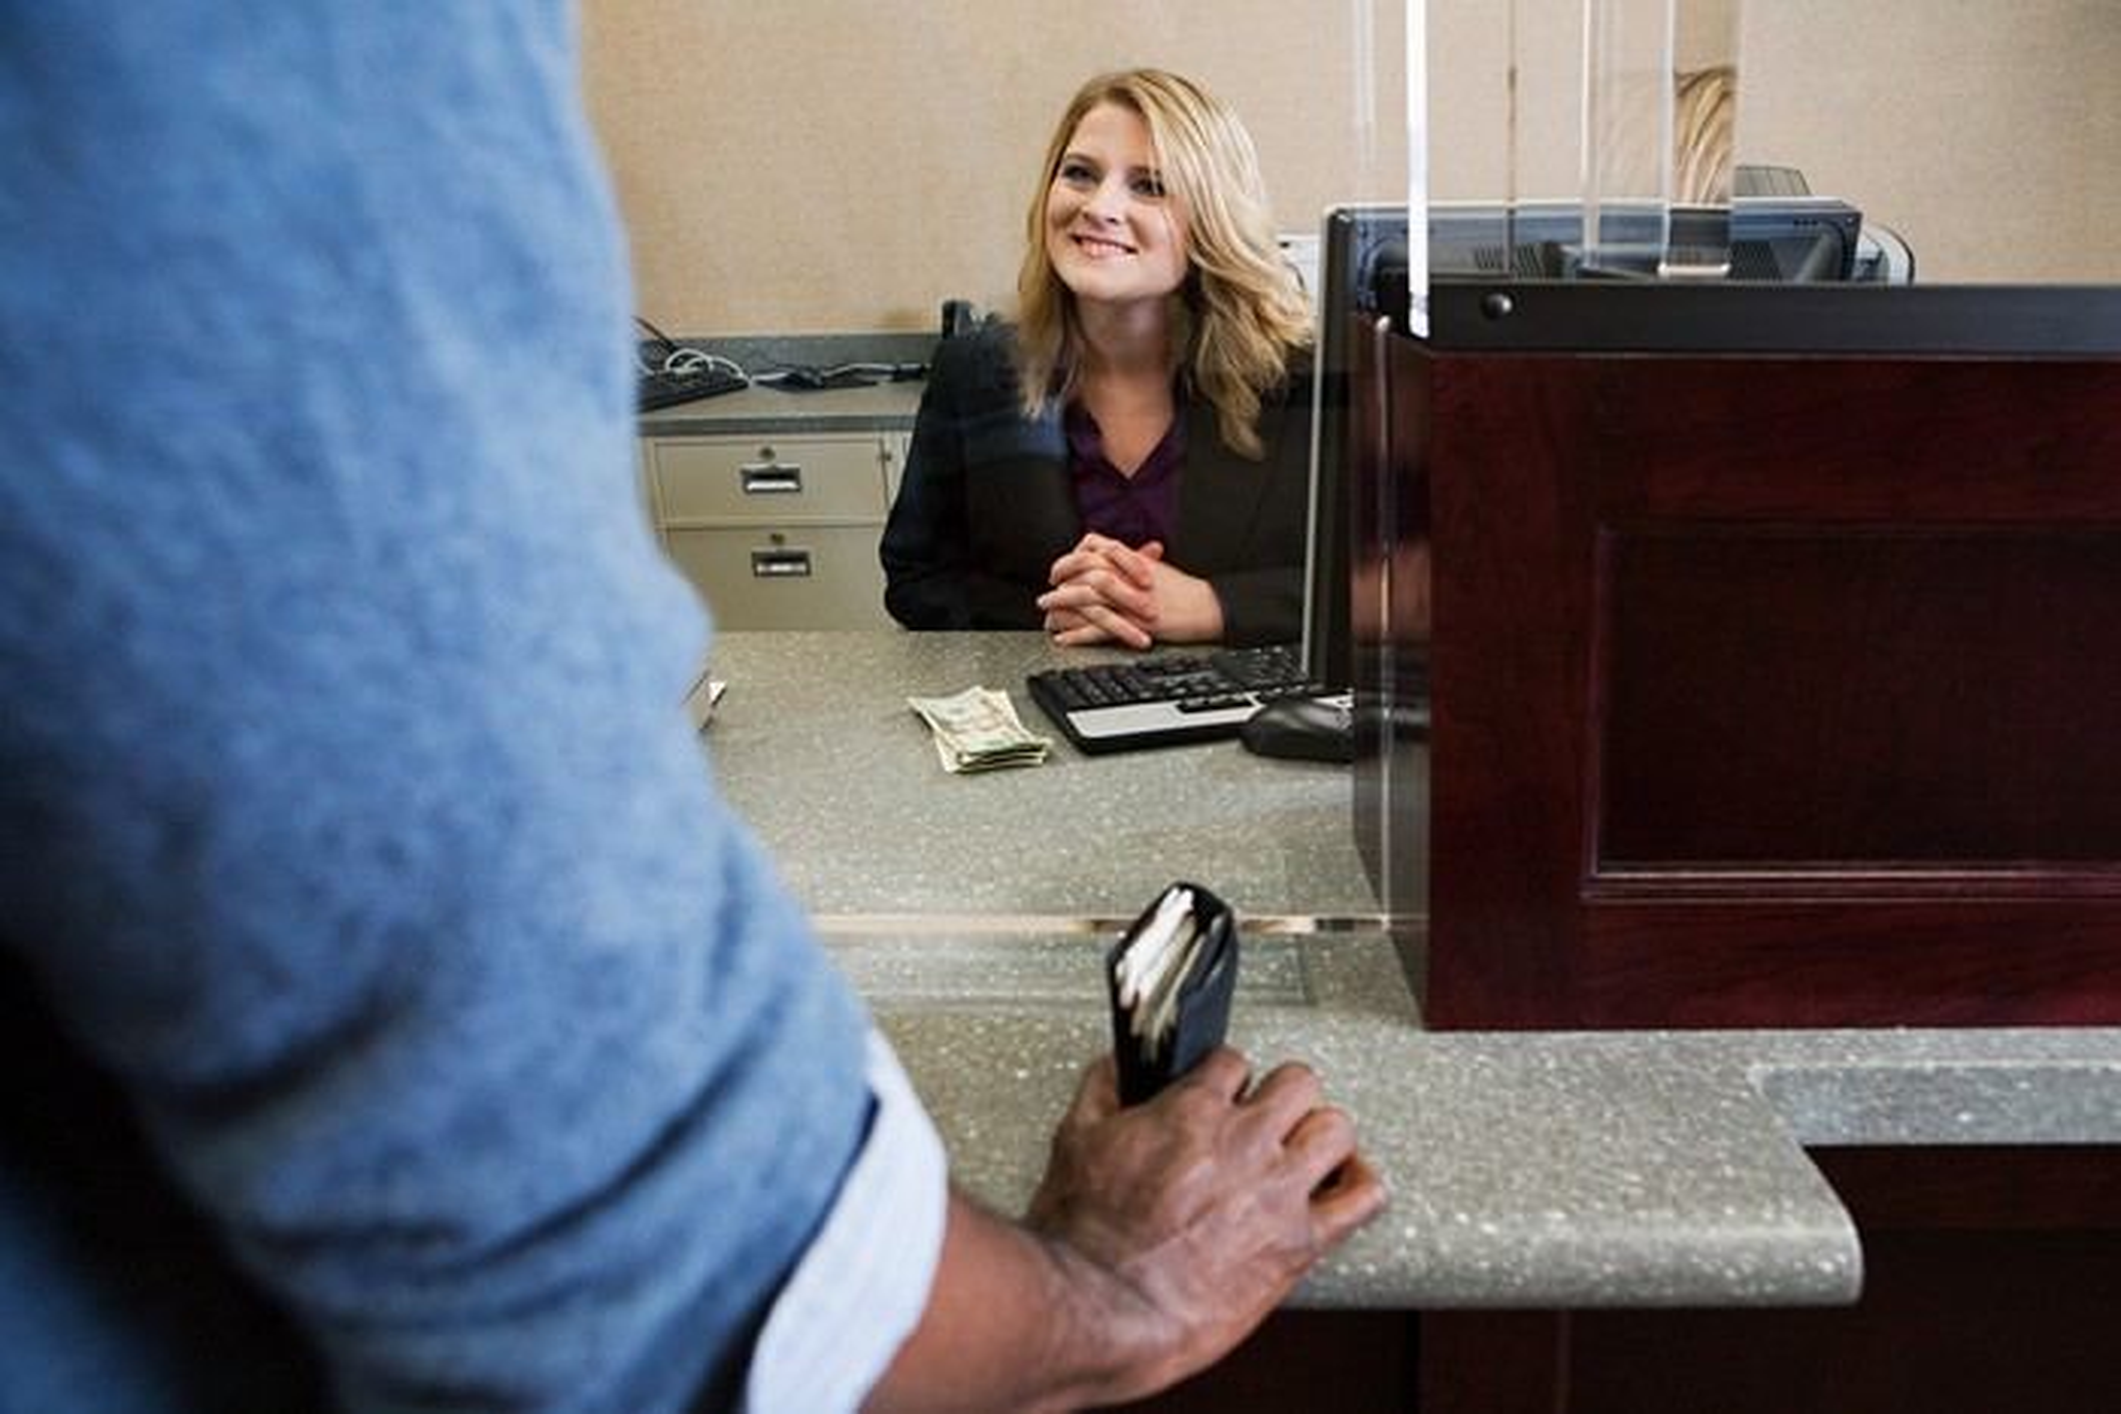 Bank teller greeting customer.